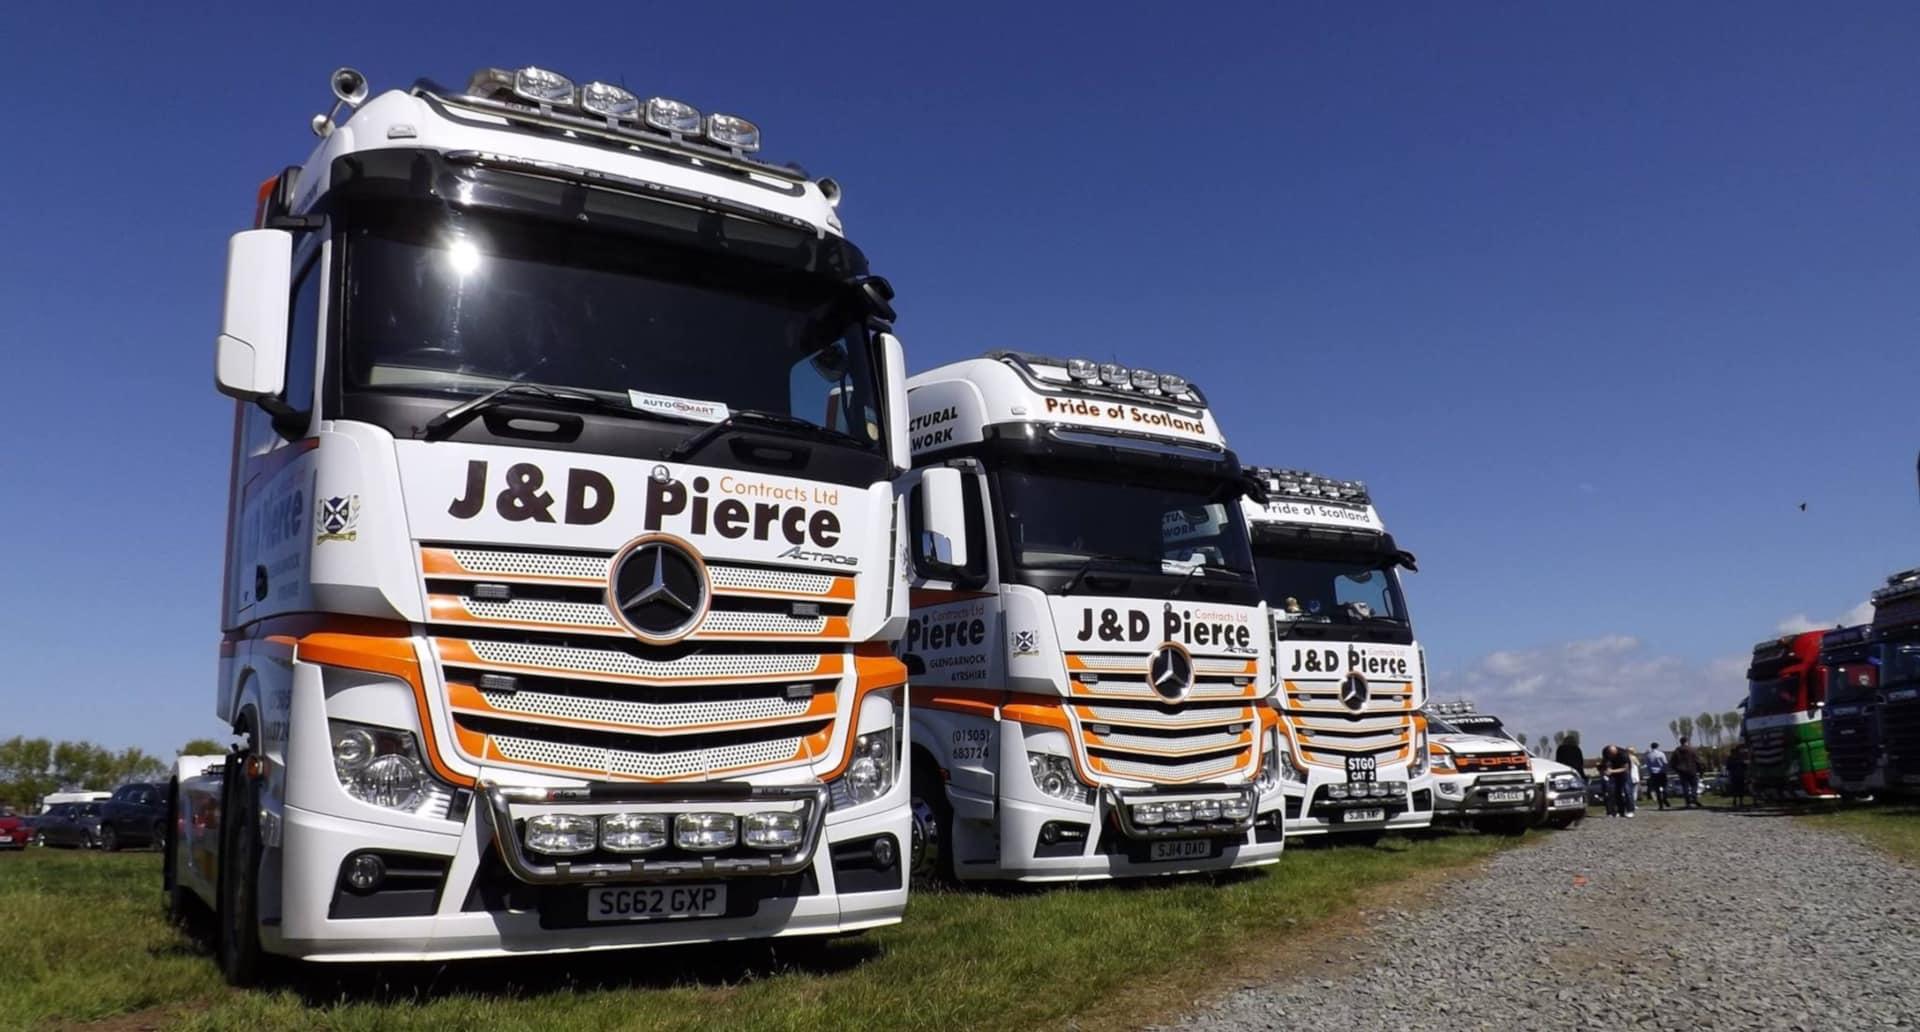 Truckfest | J & D Pierce